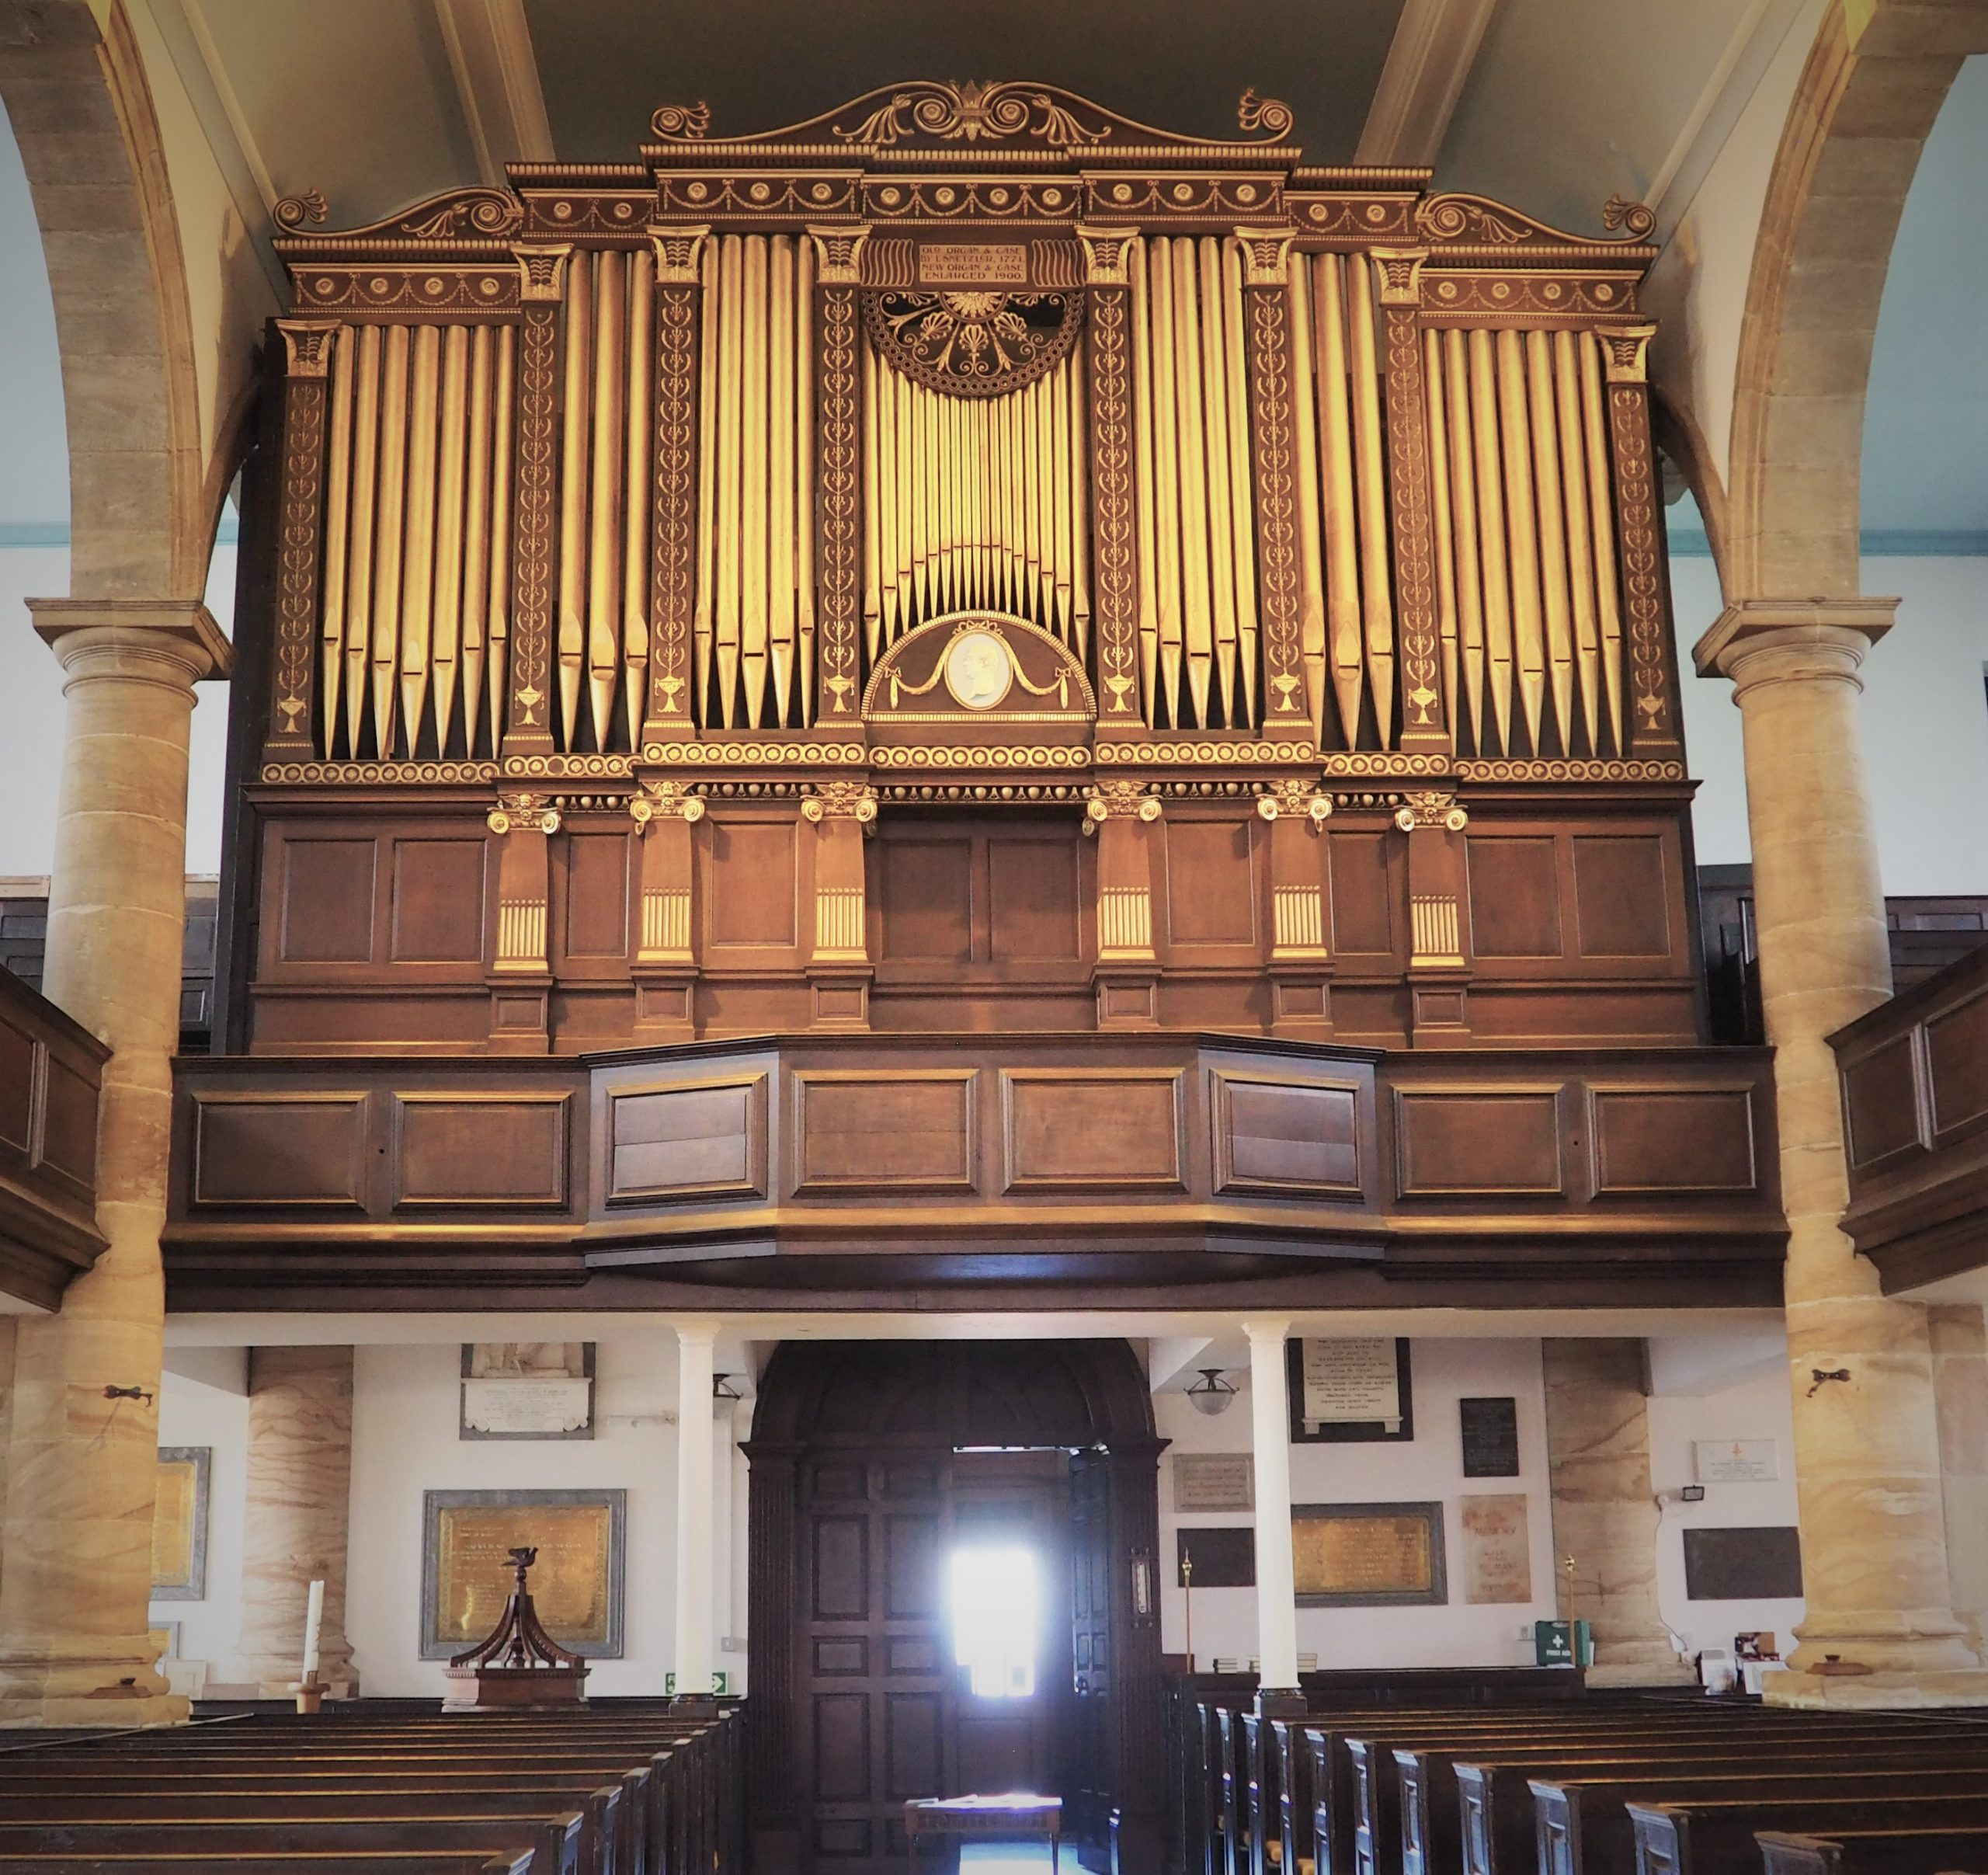 St Modwen's Organ Case